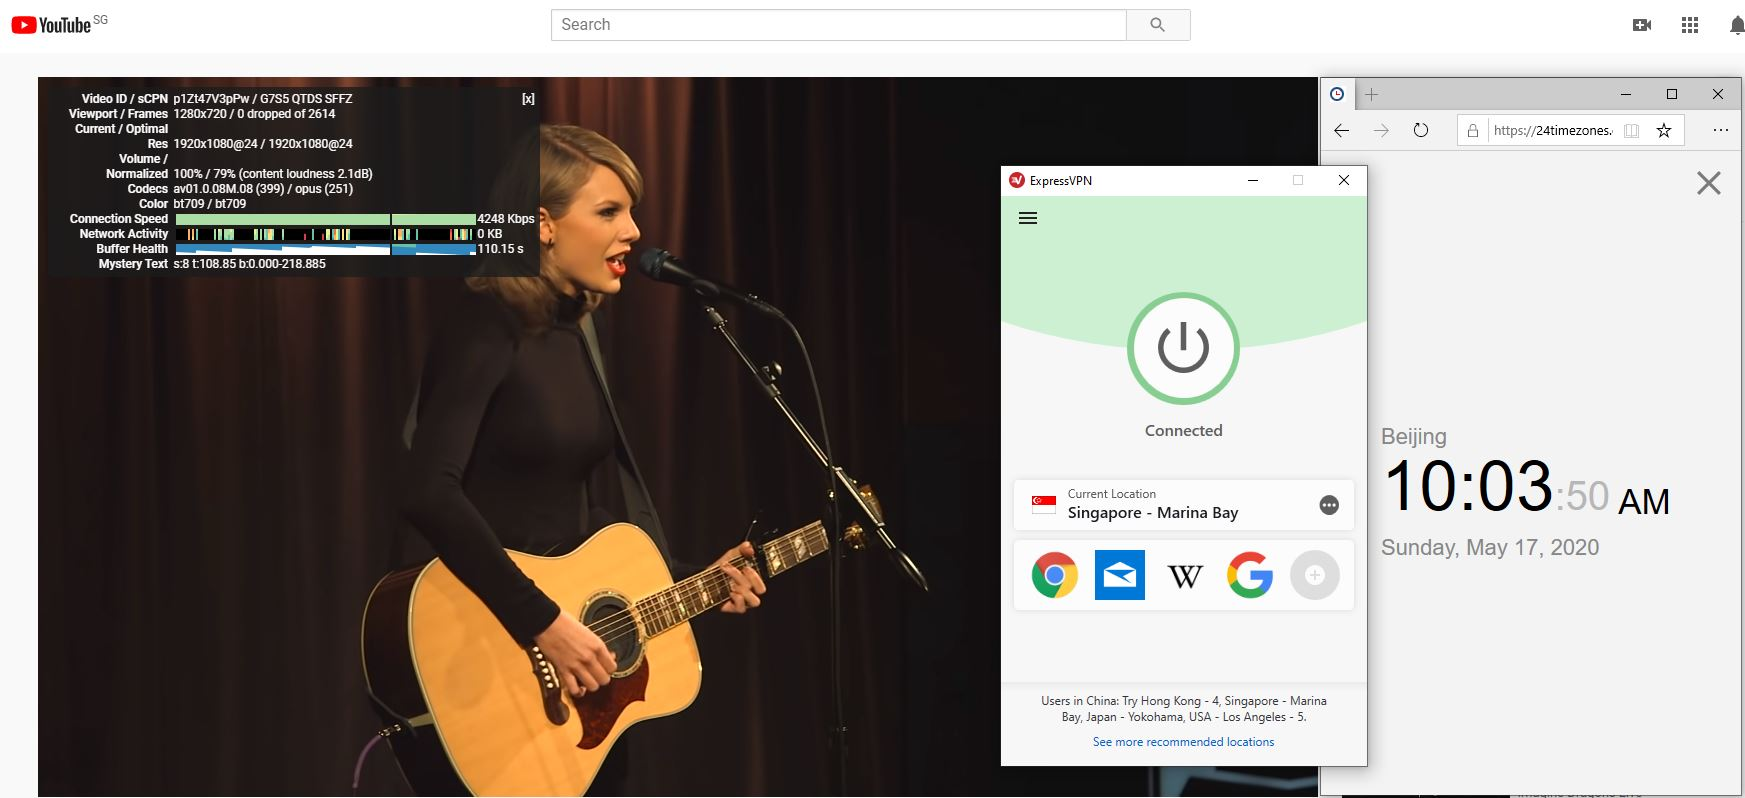 Windows10 ExpressVPN Singapore Marina Bay 中国VPN 翻墙 科学上网 youtube测速-20200517